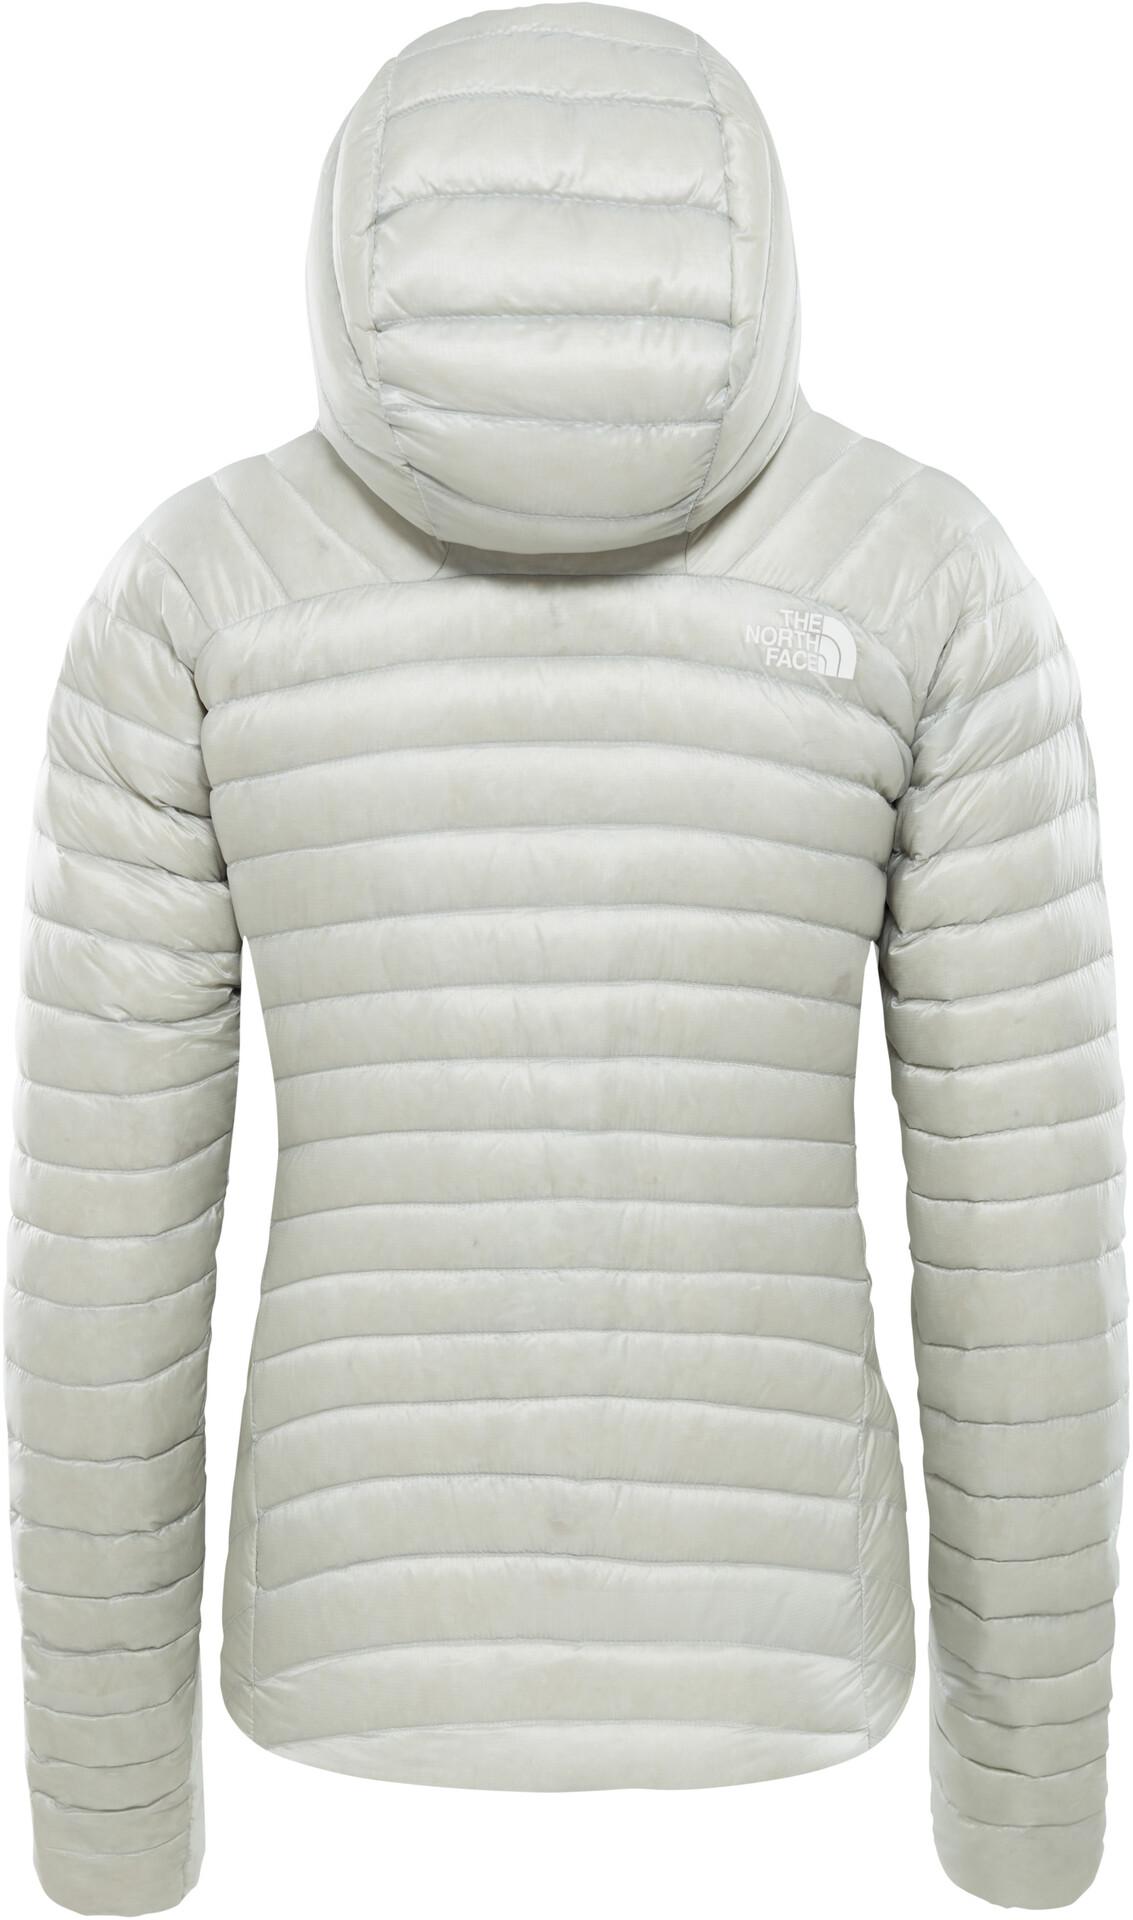 7b77cee00fa9 reduced womens north face sweater jacket b2c08 981cf